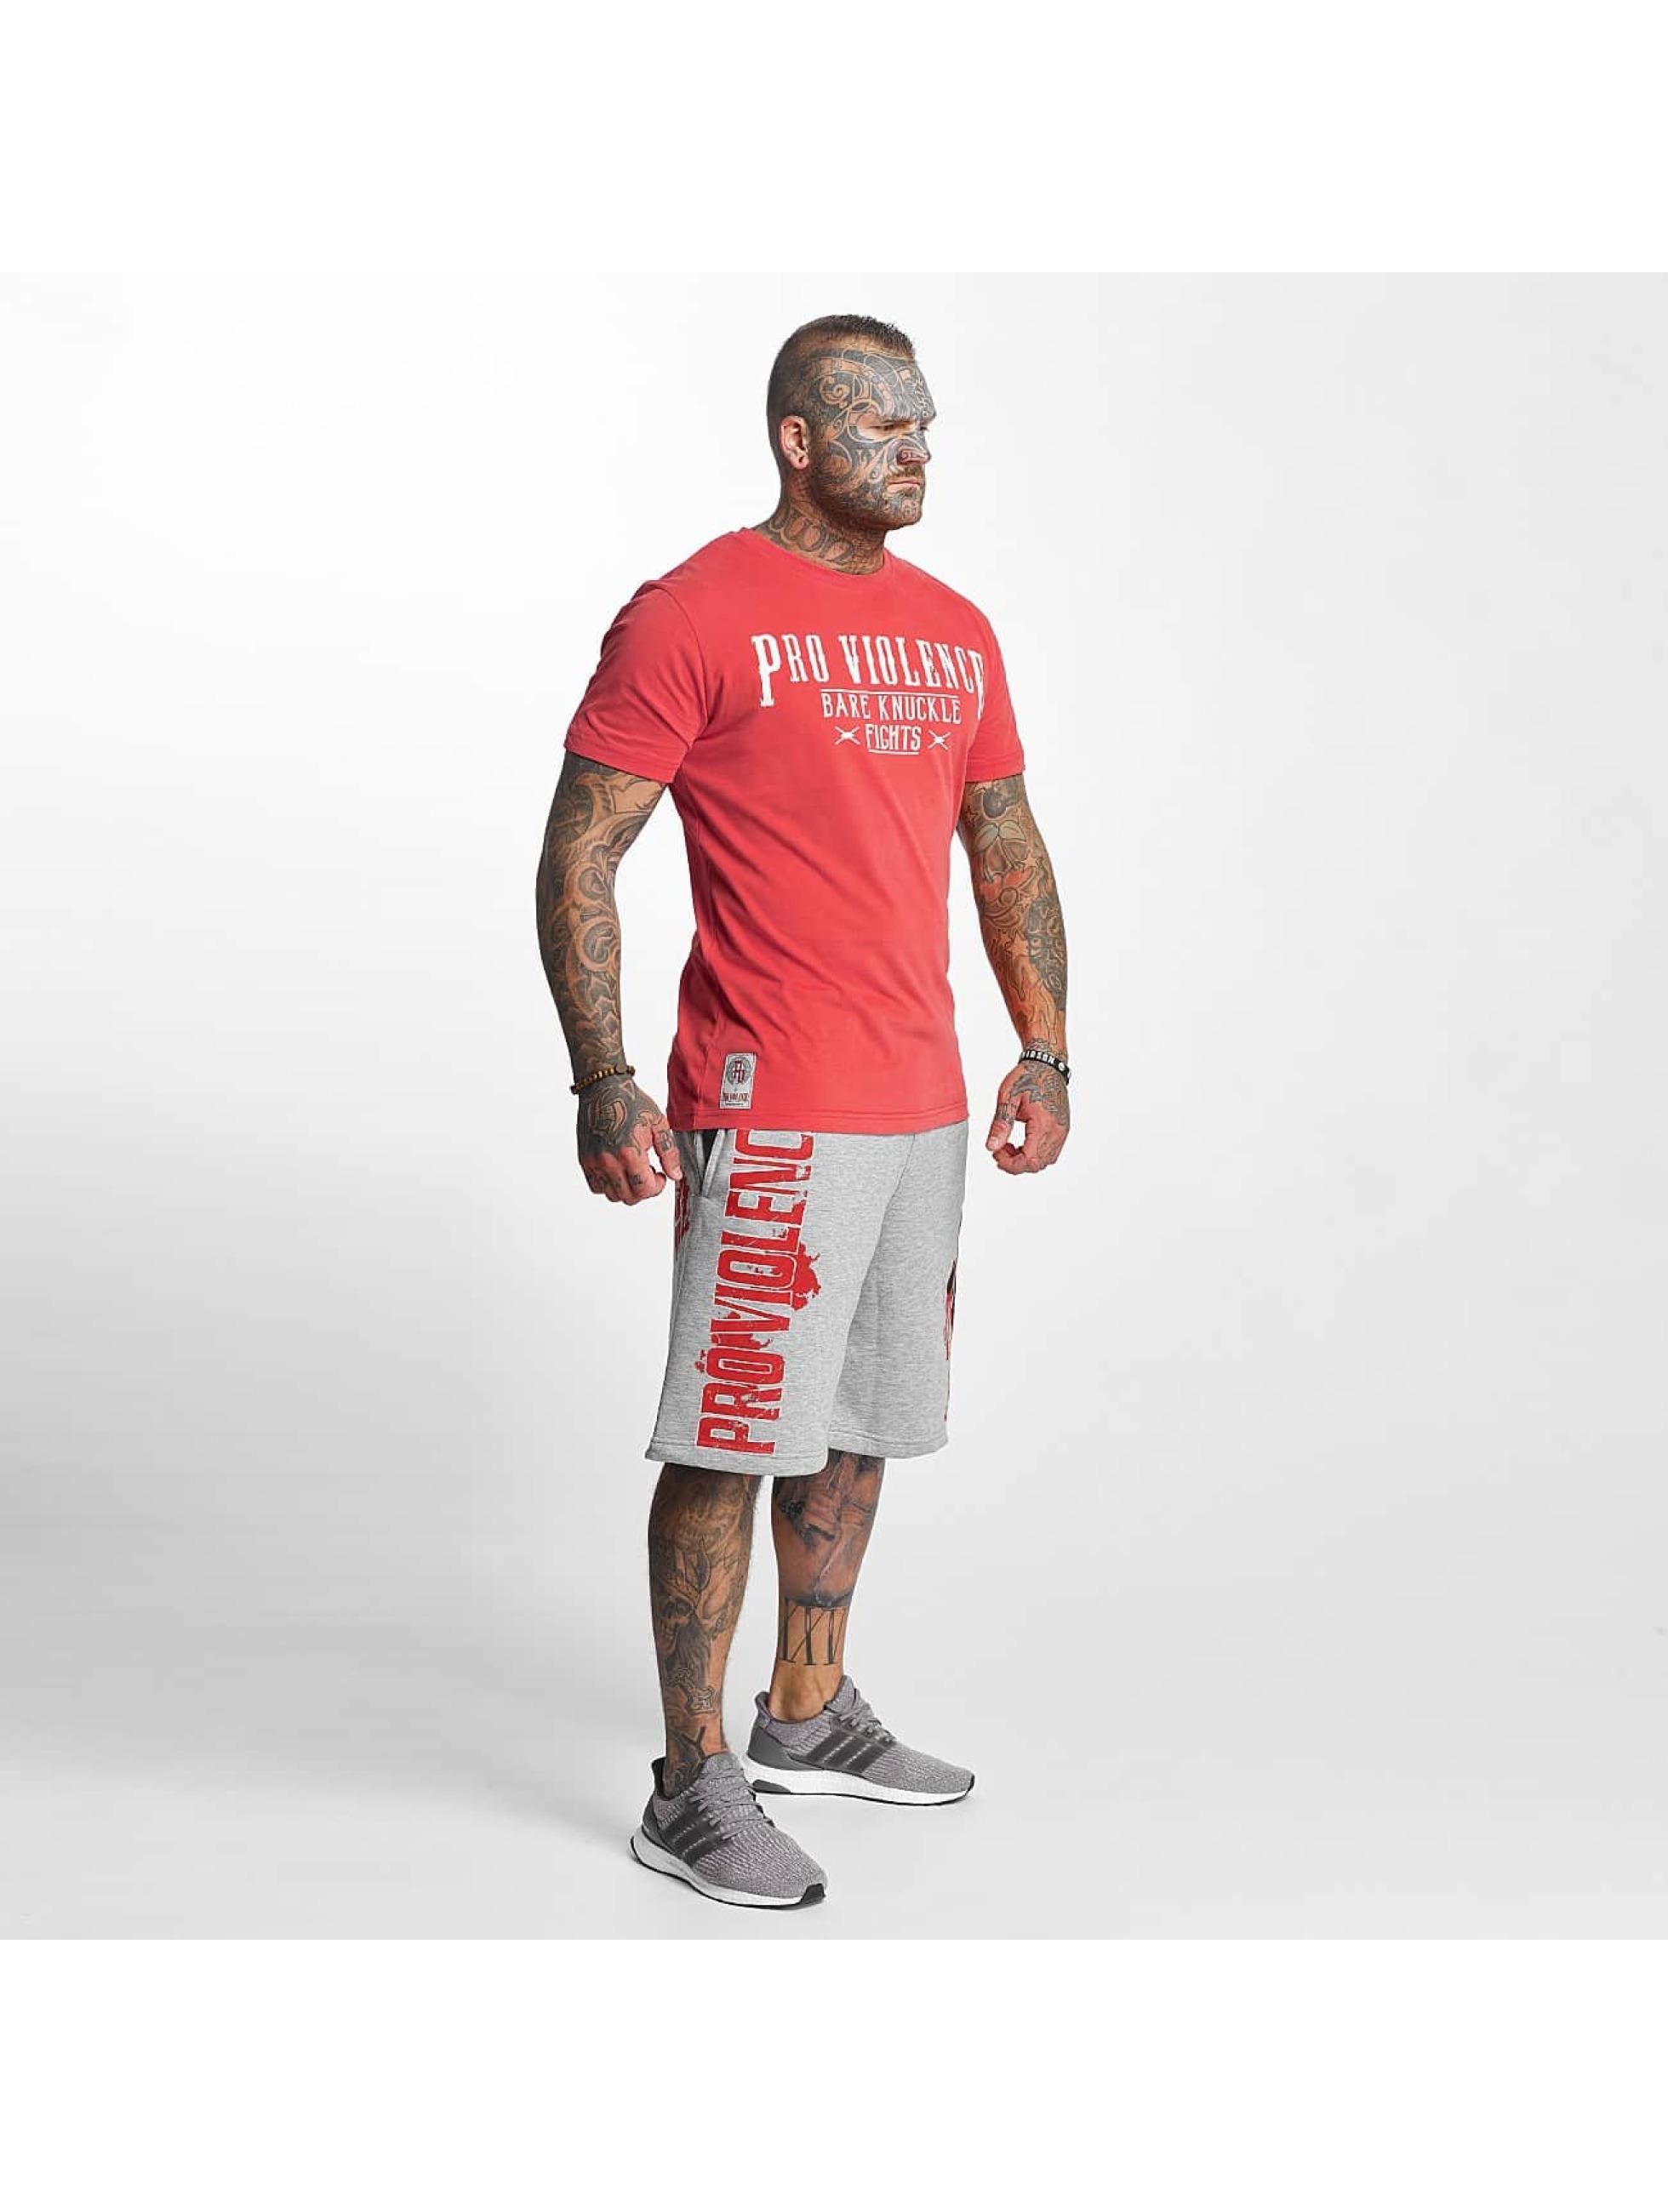 Pro Violence Streetwear T-paidat Knuckle Bare punainen